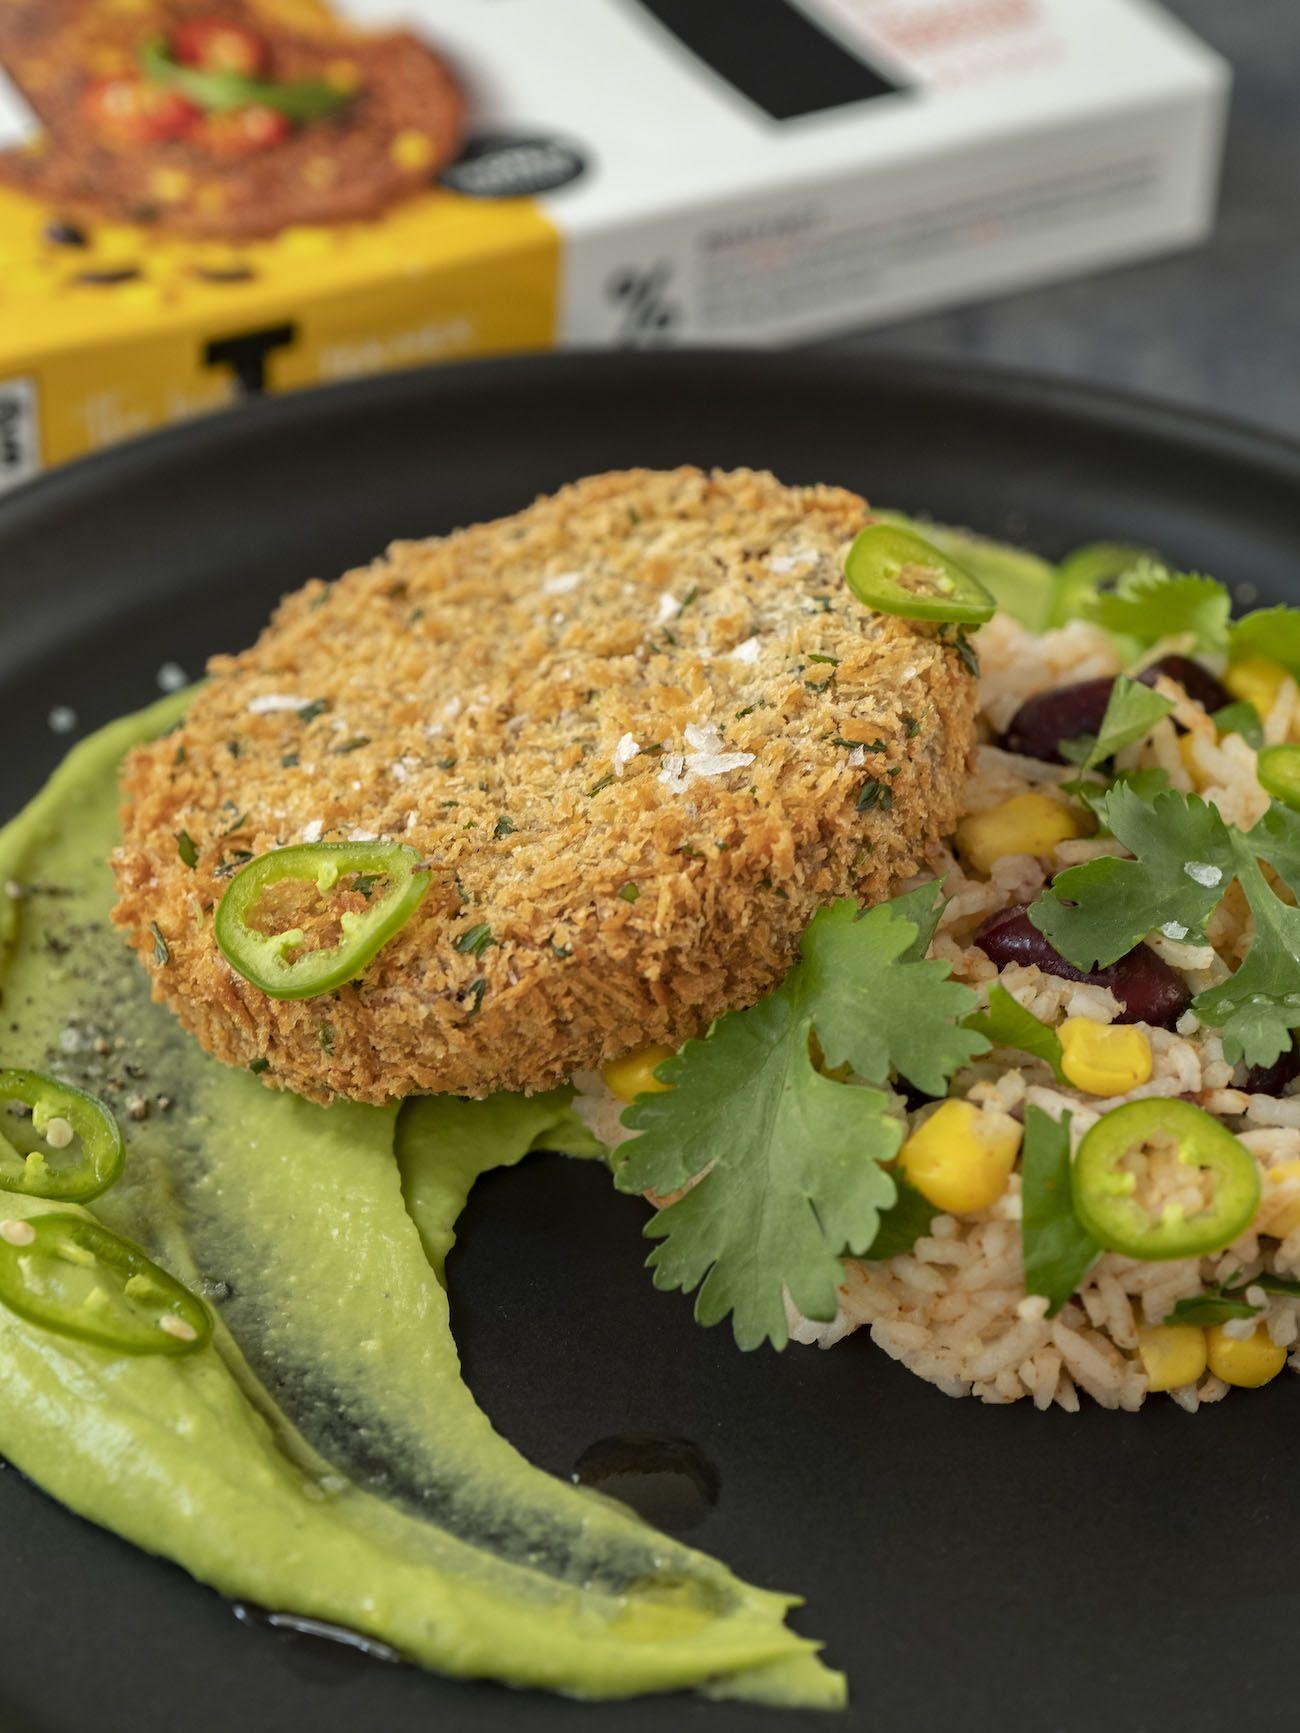 About Fuel, Foodblog, Bold Foods, Rezept, The Big T Schnitzel mit Reis und Avocadocreme, Panko, Jalapeño, Salz